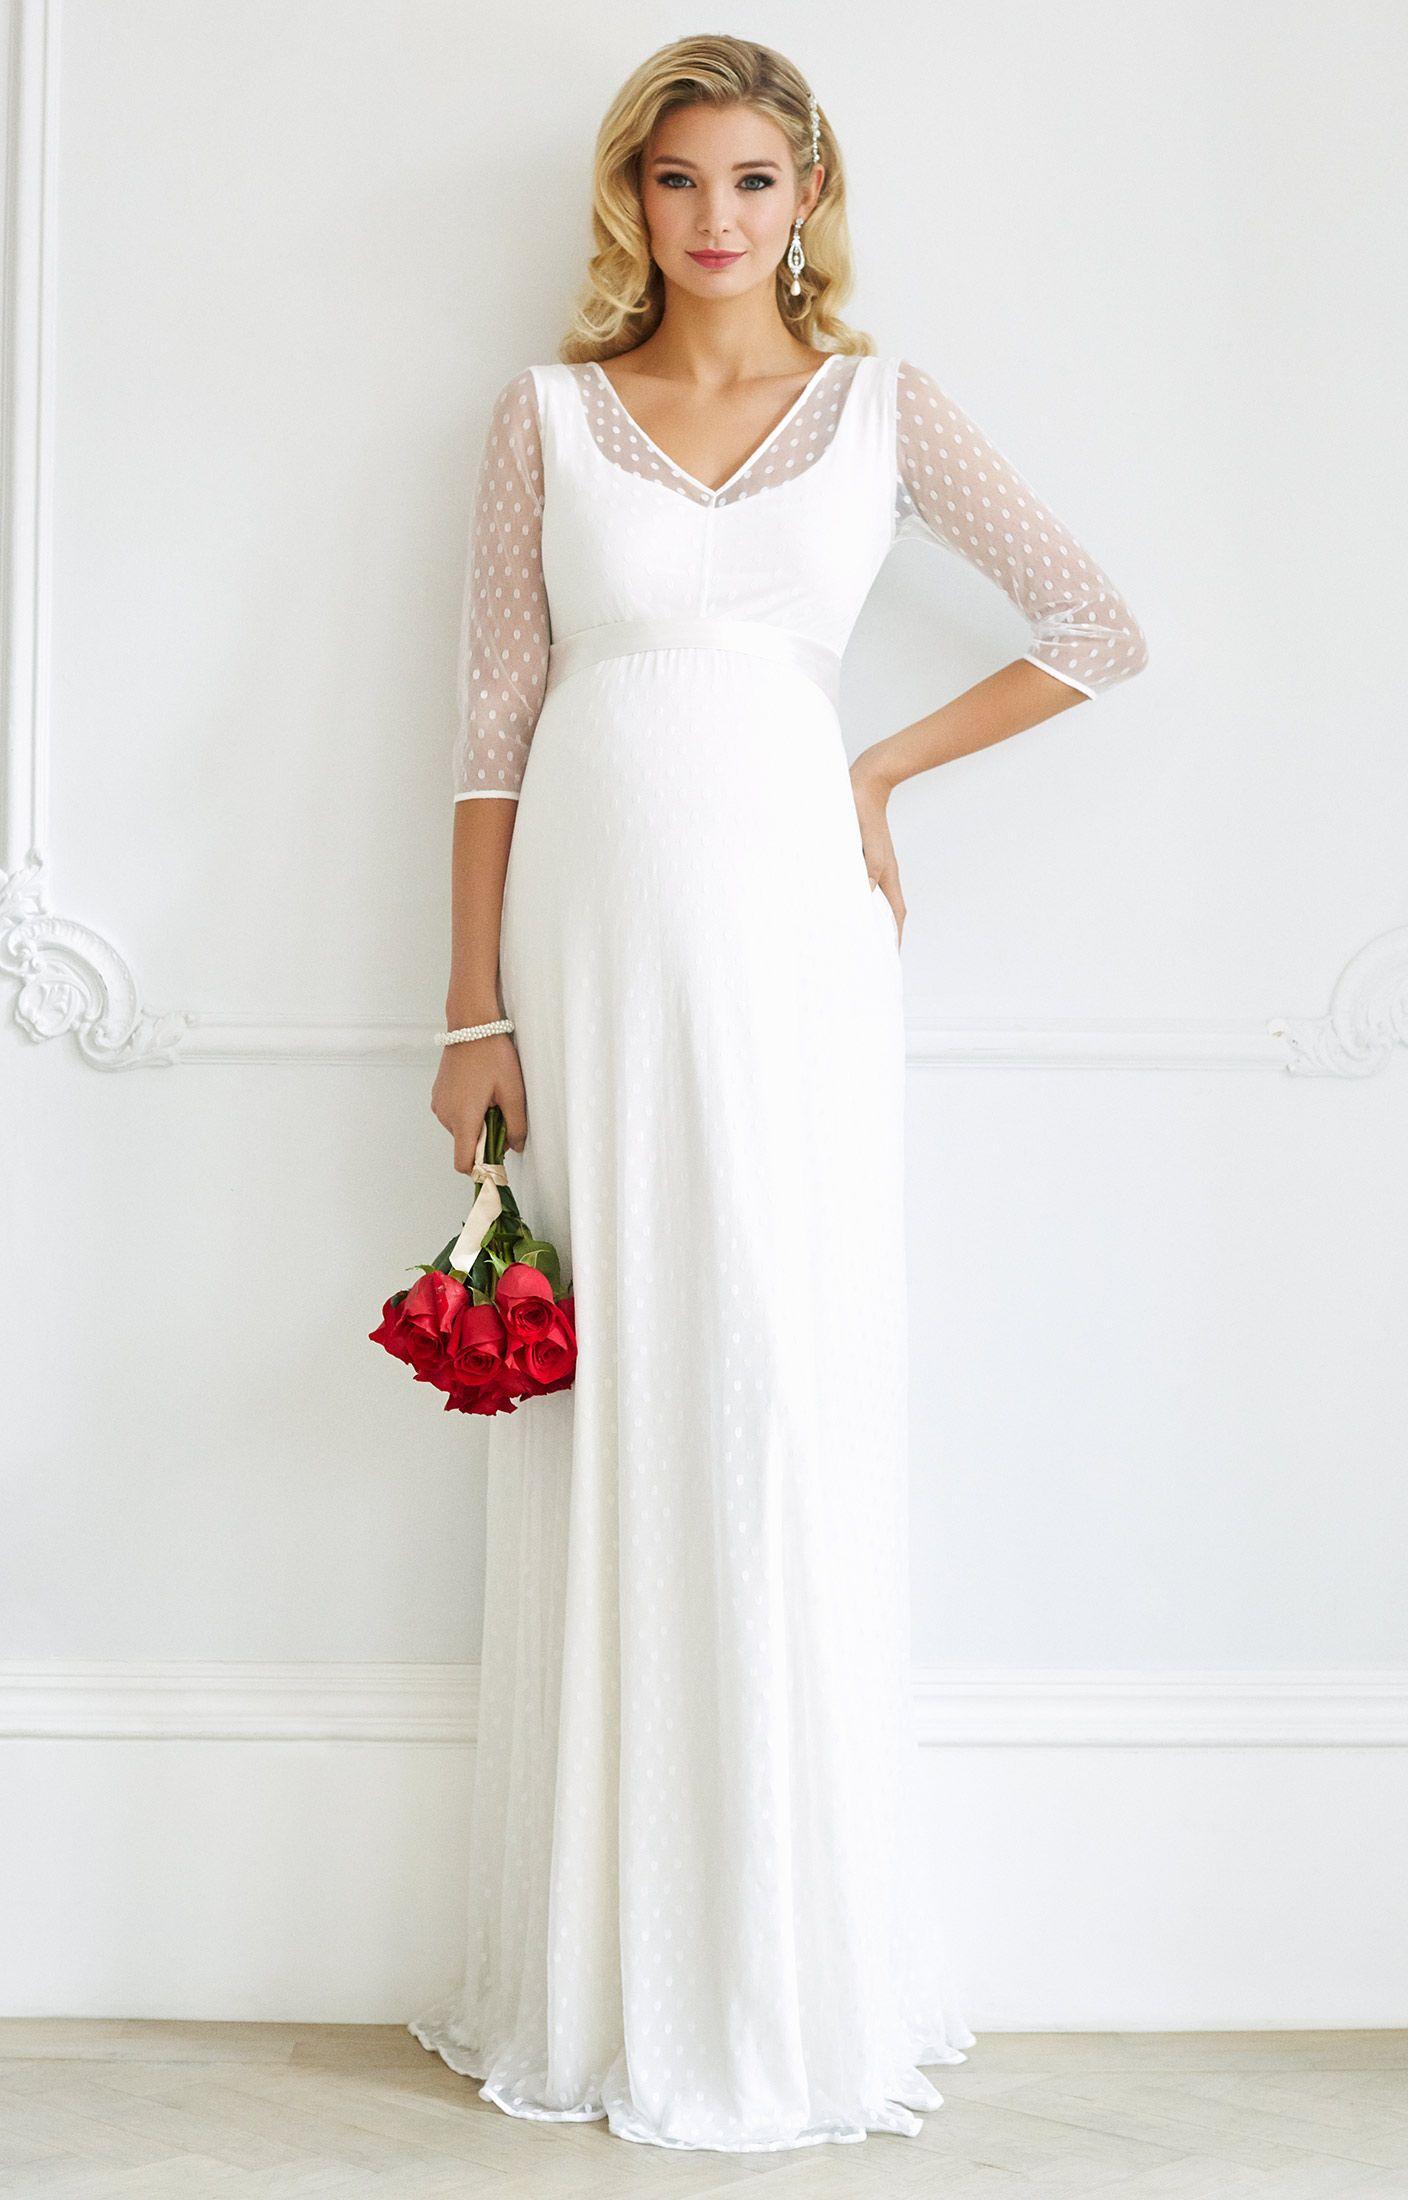 White maternity wedding dress  Silvia Gown  Maternity Wedding  Pinterest  Tiffany rose Weddings